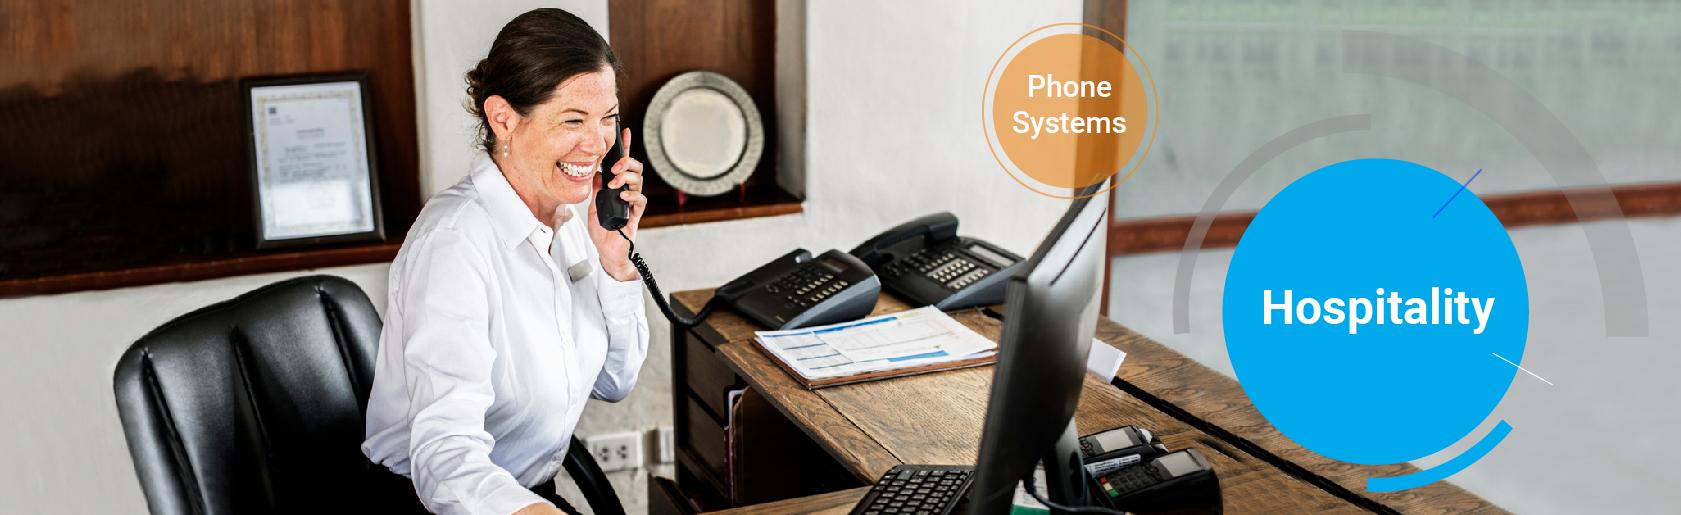 hotel phone system_hospitality phone system